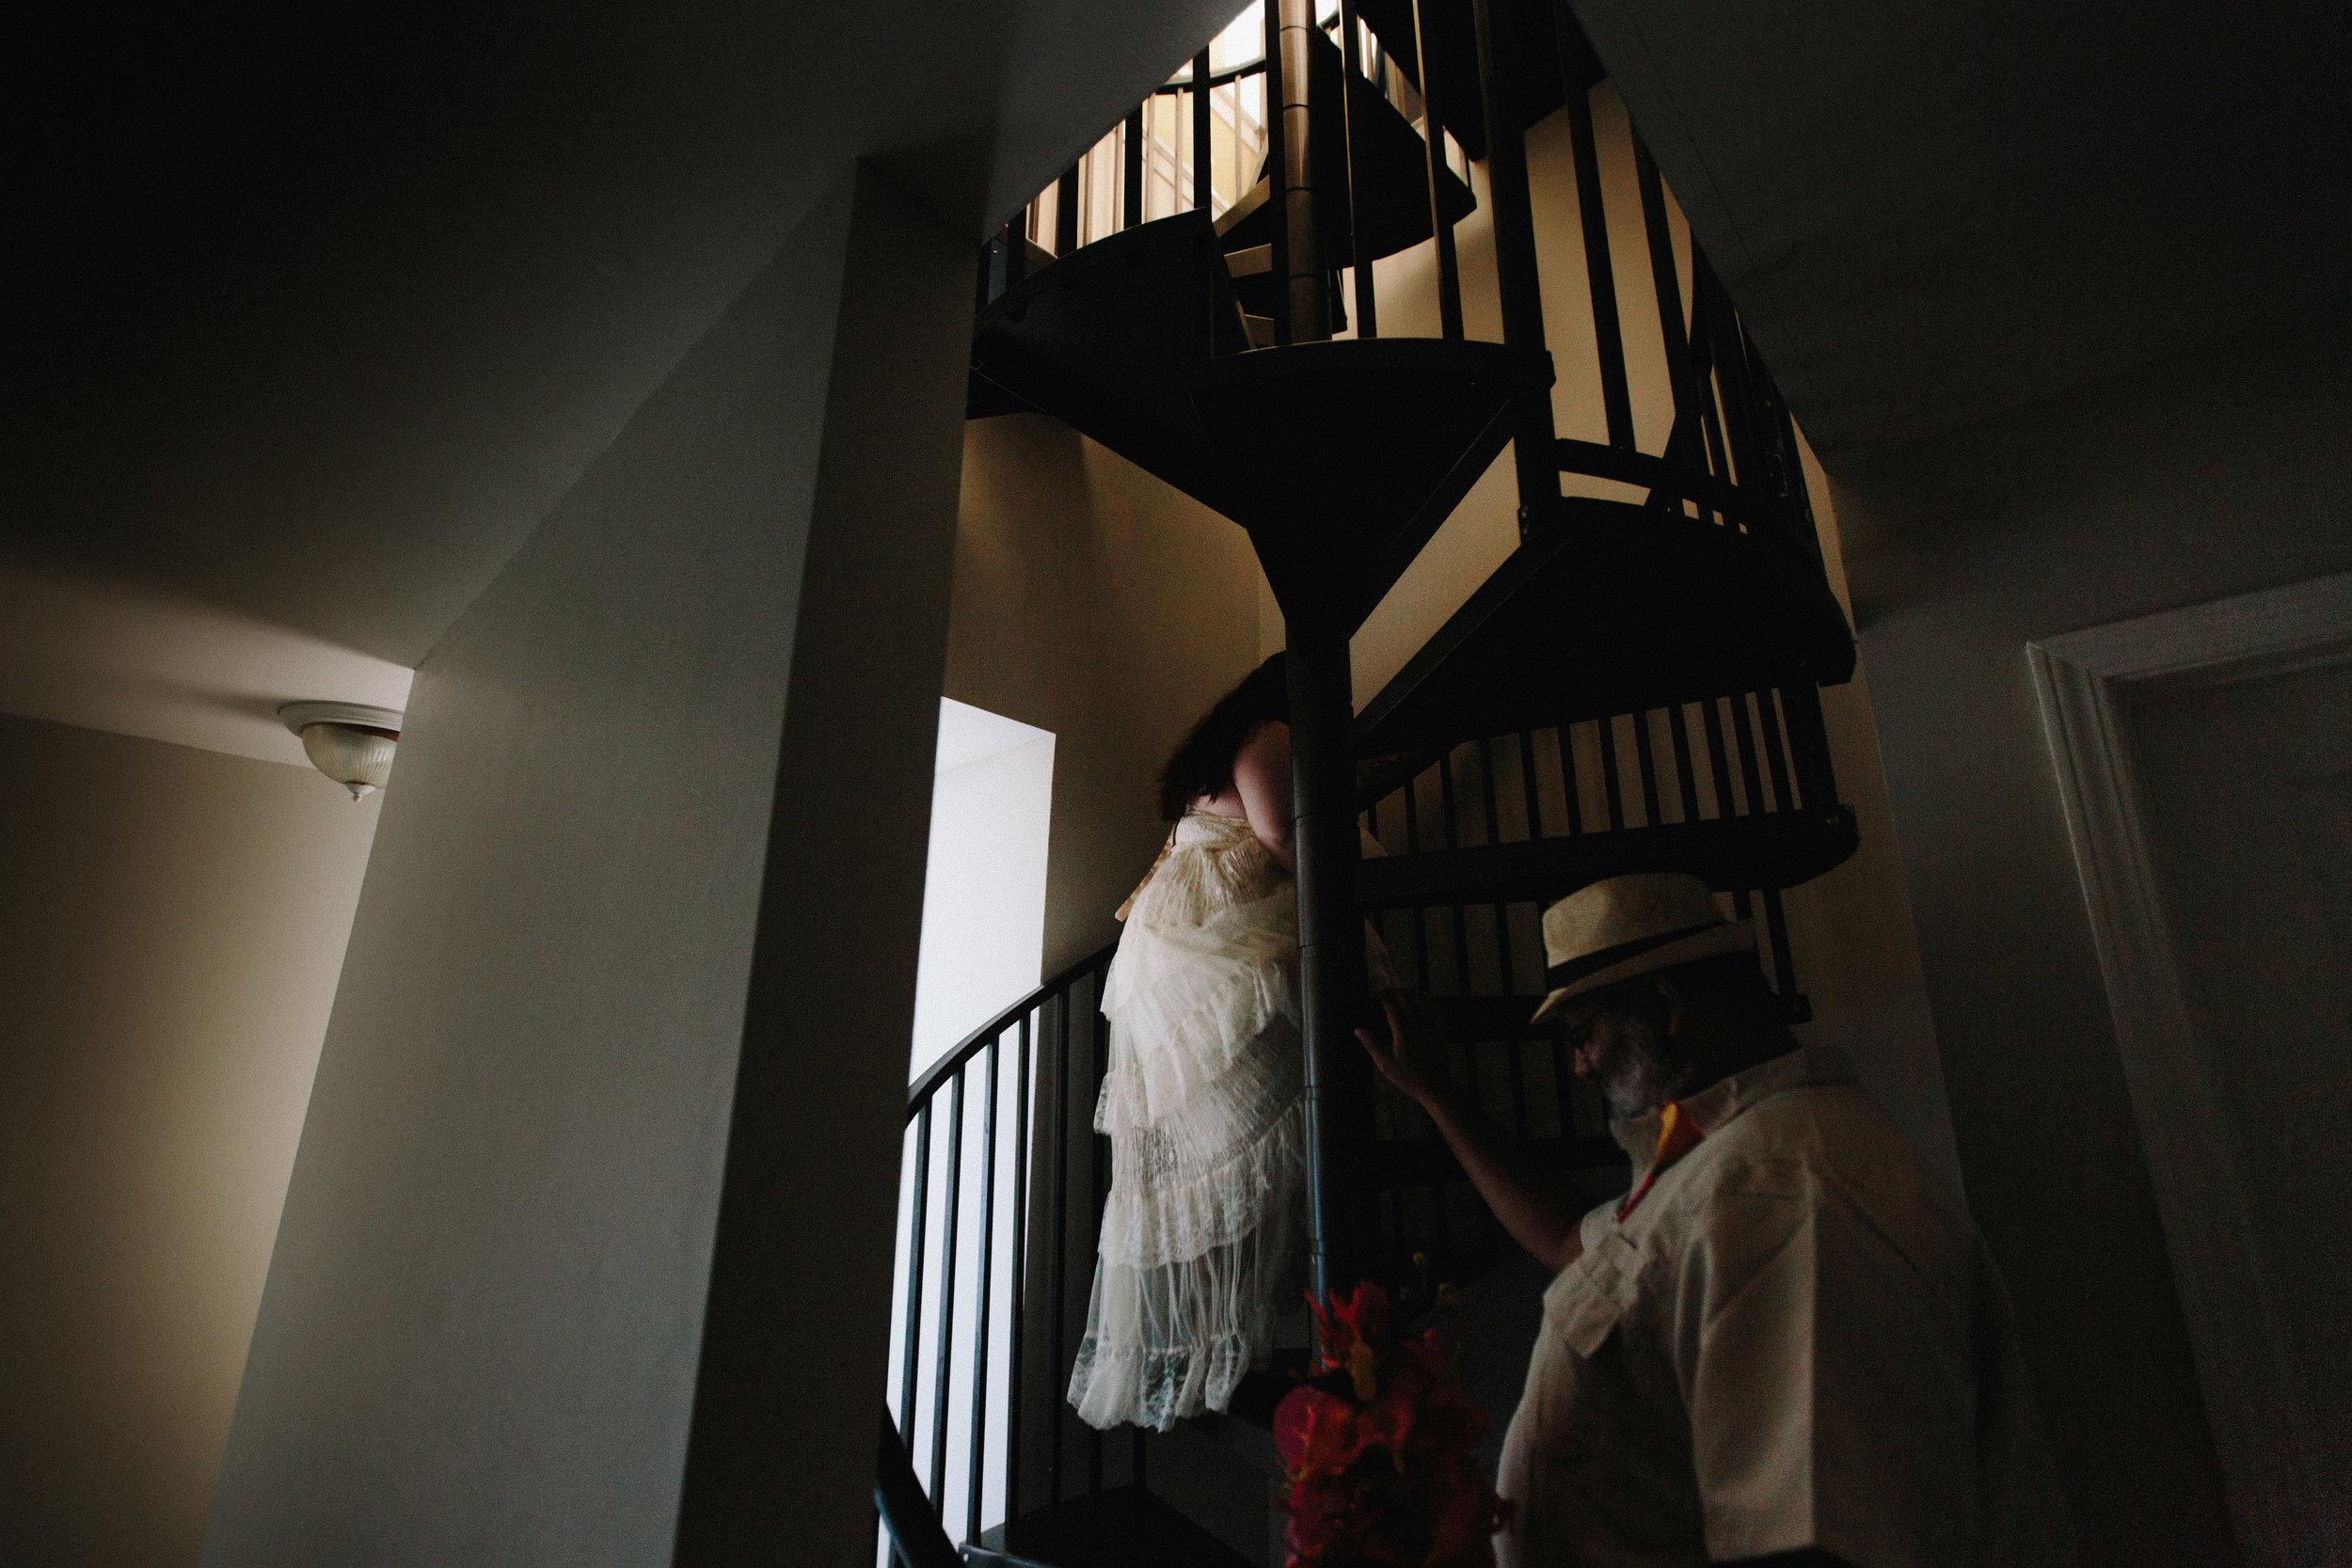 destin_sunset_beach_elopement_intimate_wedding_photographer_florida_documentary_1068.jpg